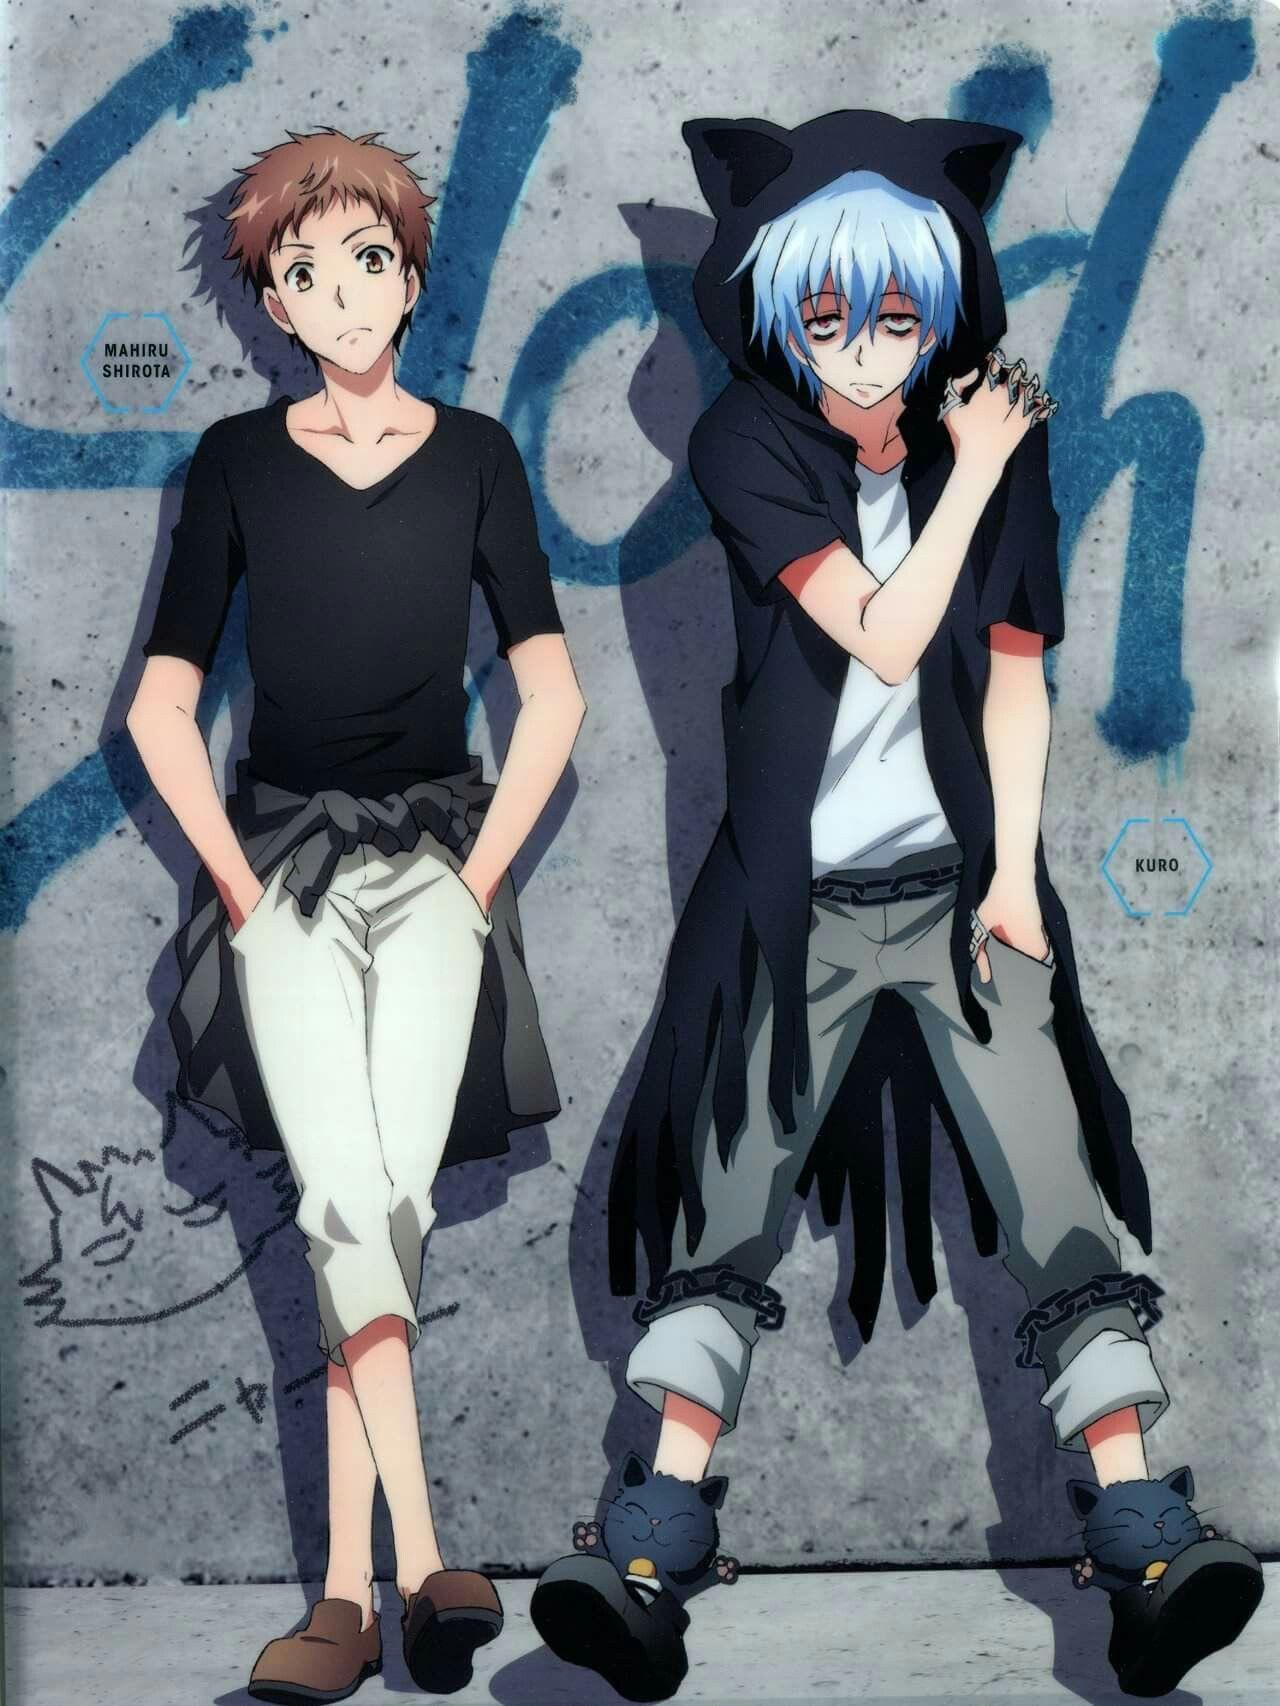 Kuro and Mahiru(Sloth pair) from Animedia Deluxe(I posted